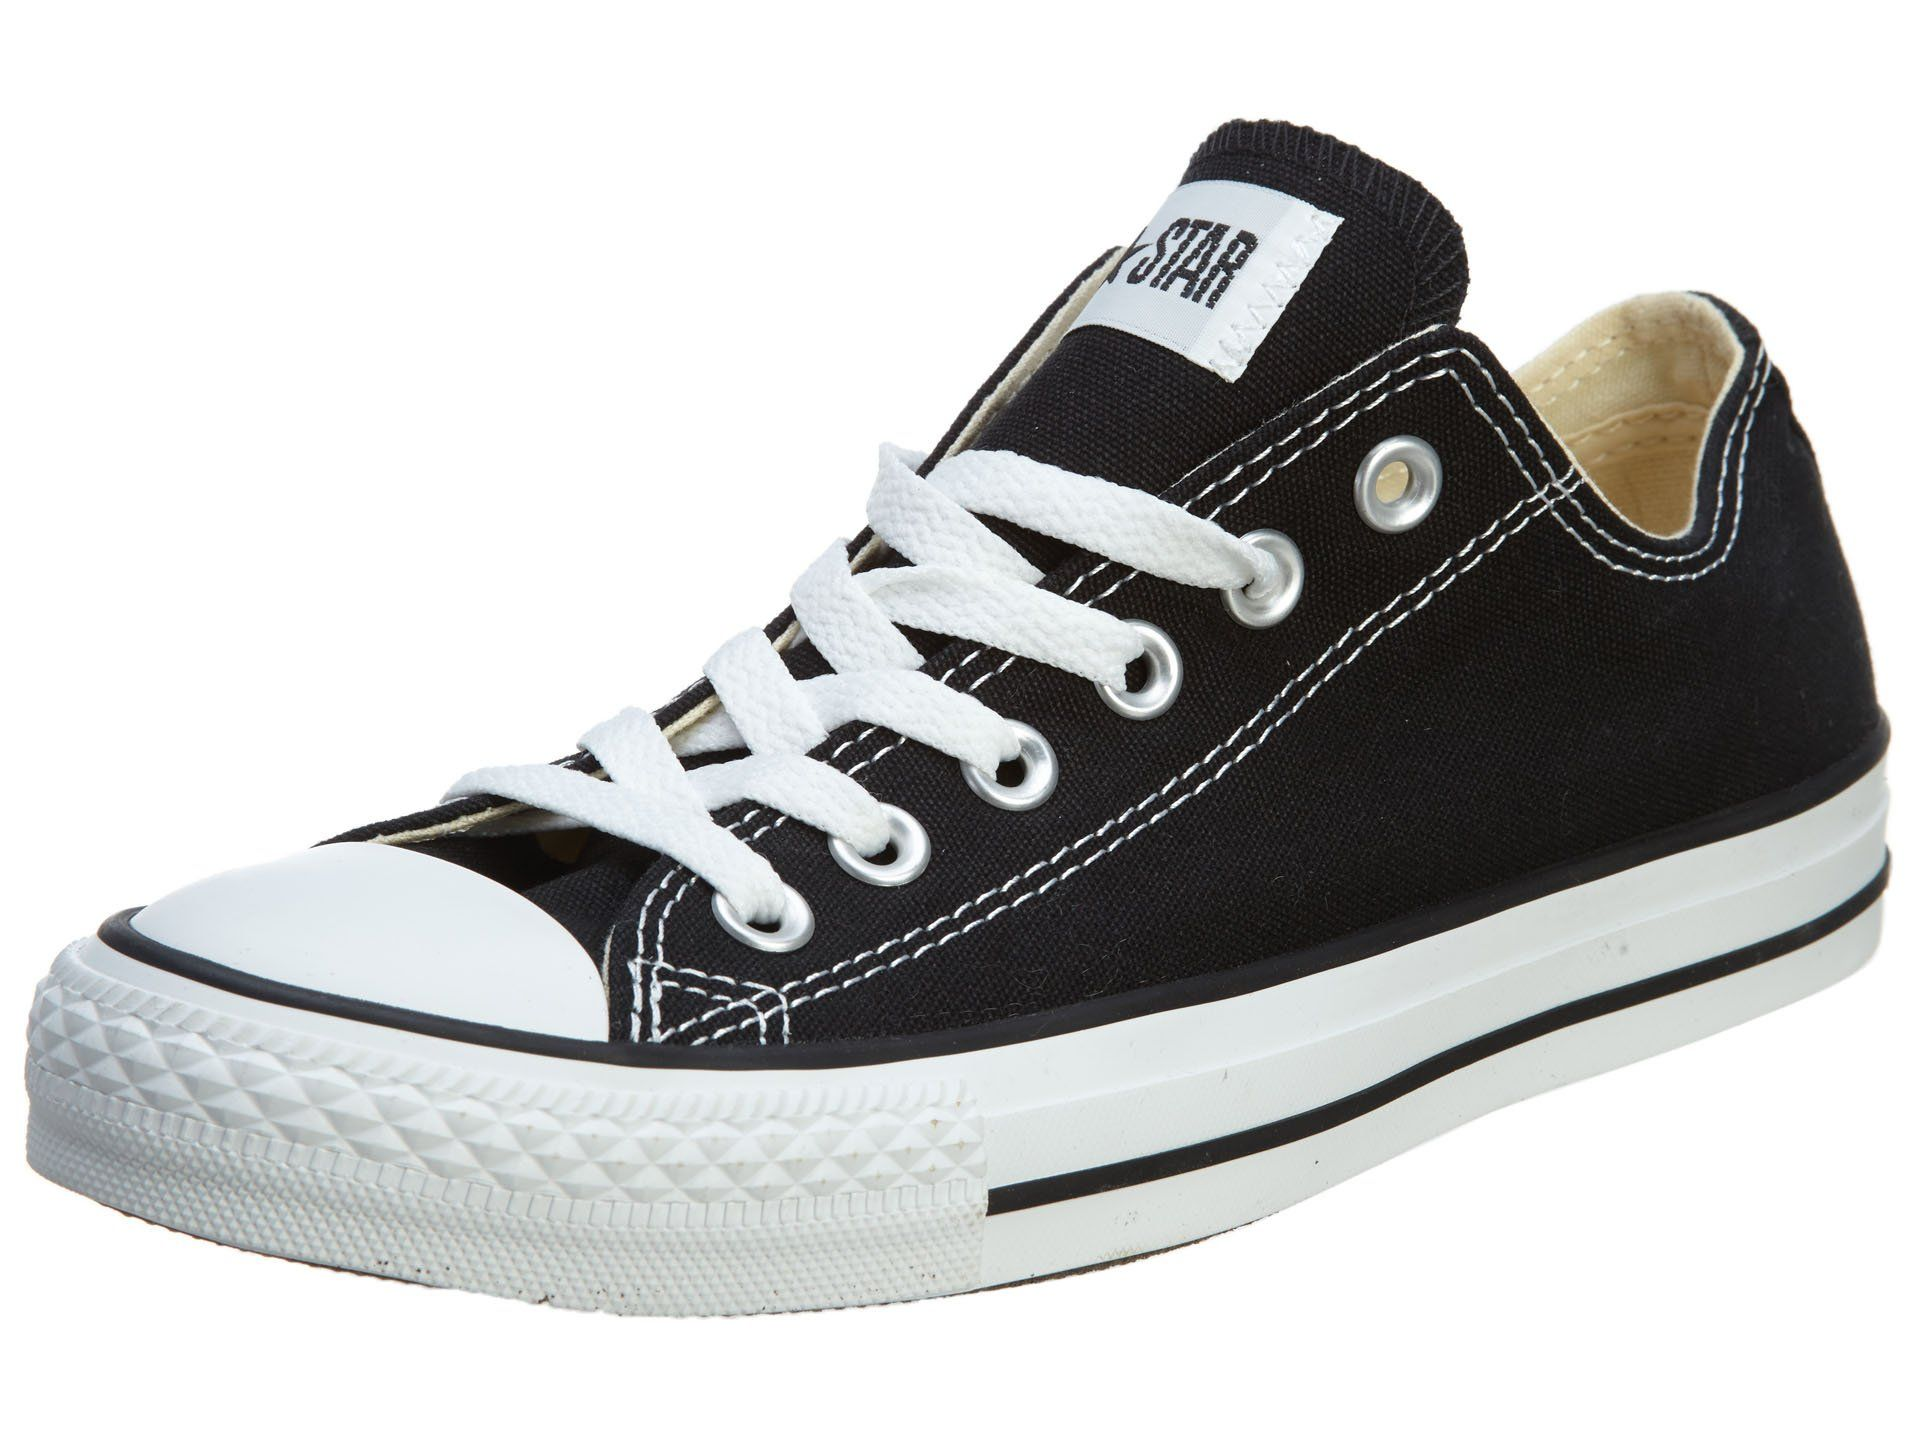 Converse Chuck Taylor All Star Hi Black M9166 Black